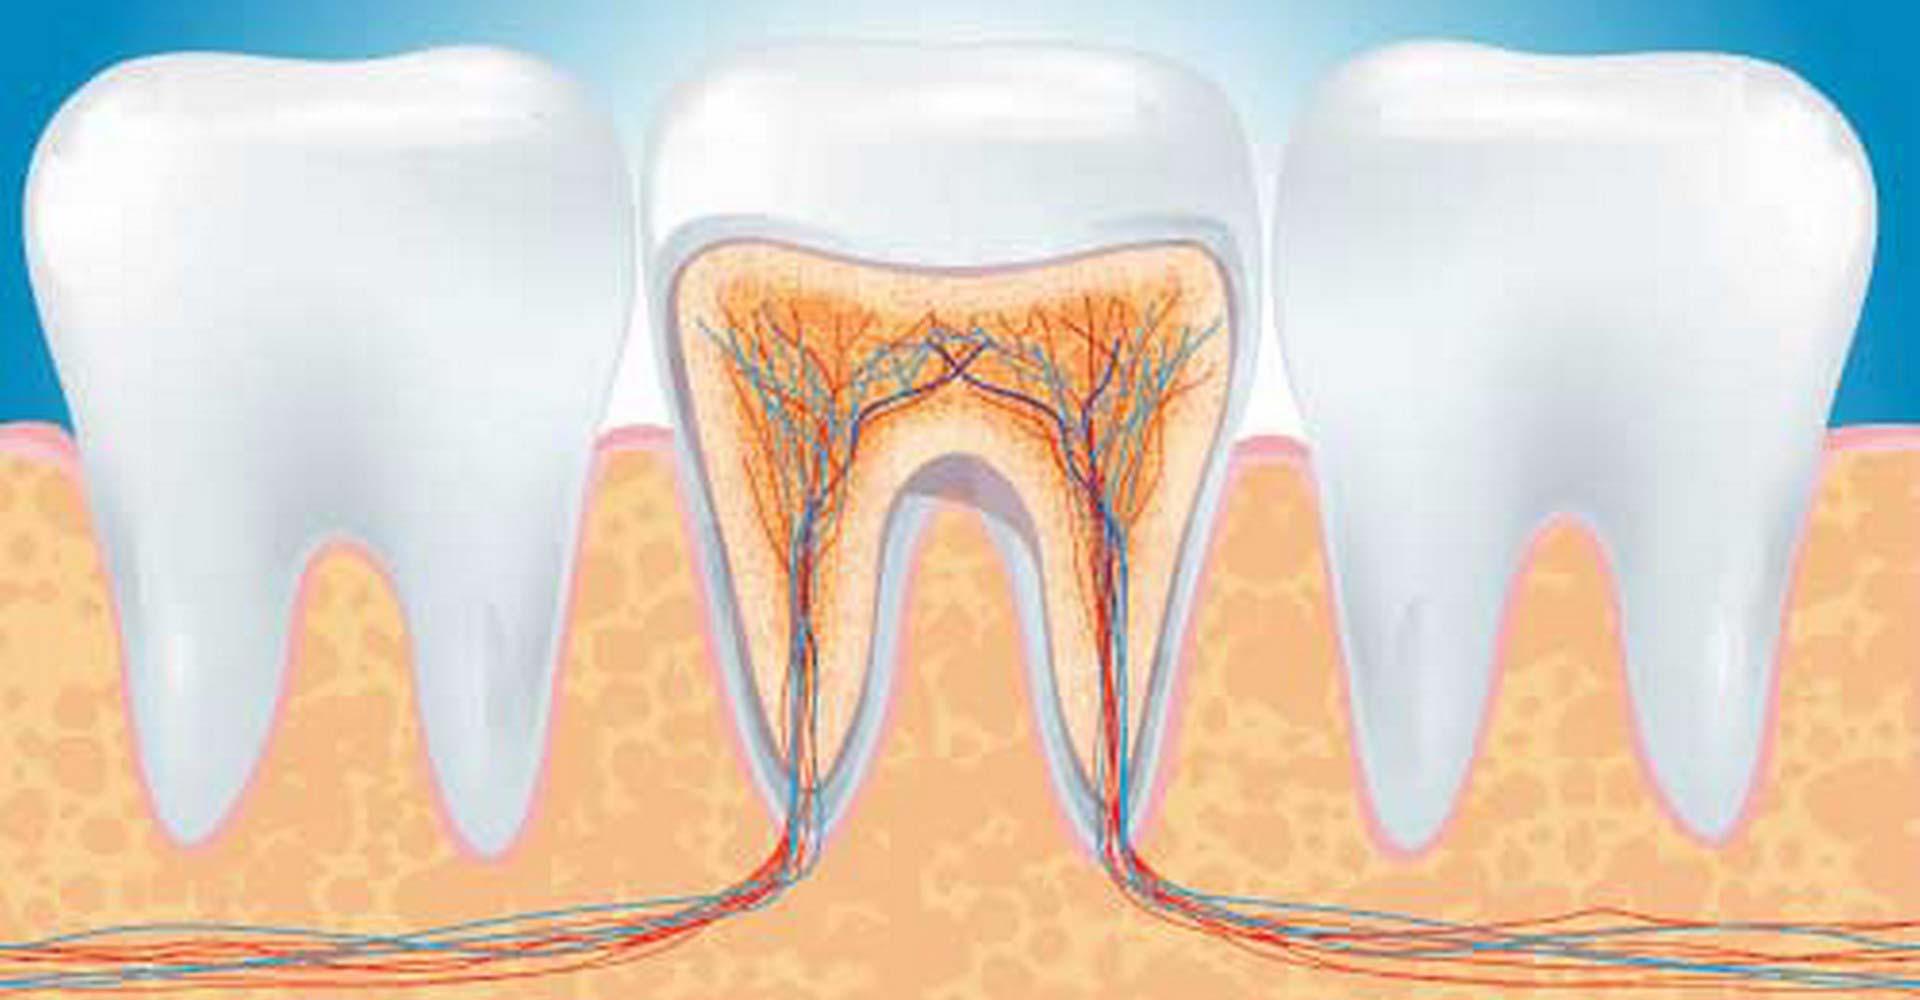 Odontoiatra Ferrara Dentista Ferrara Studio Odontoiatrico Dott. Nicola Mobilio Prestazioni - Igiene orale Endodonzia